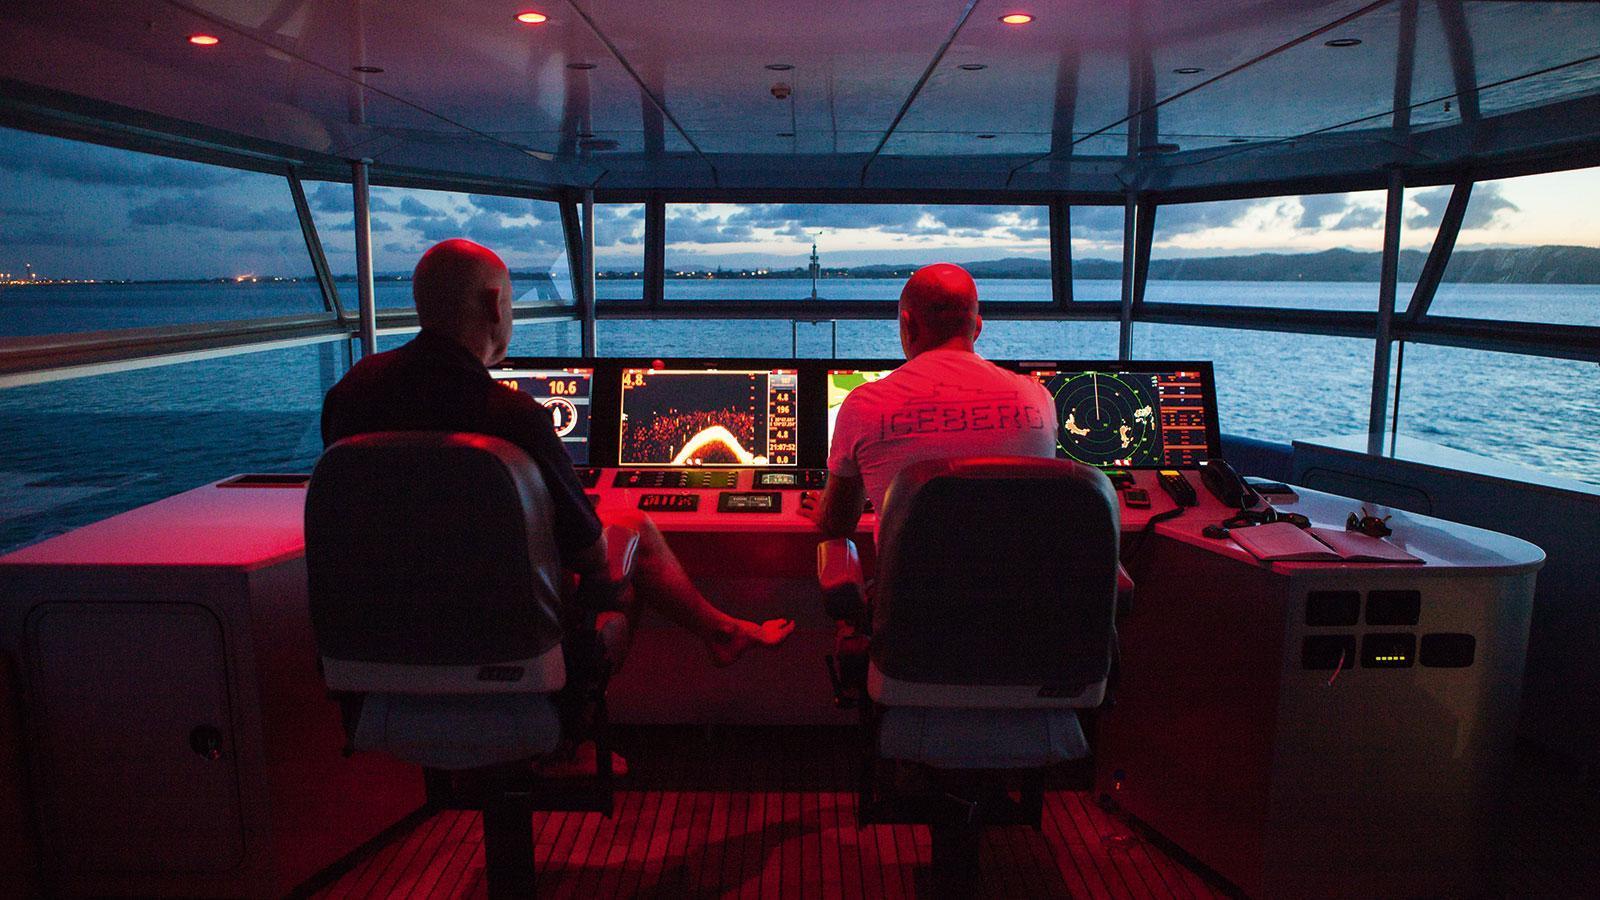 iceberg-motor-yacht-circa-marine-fpb-97-2015-34m-bridge